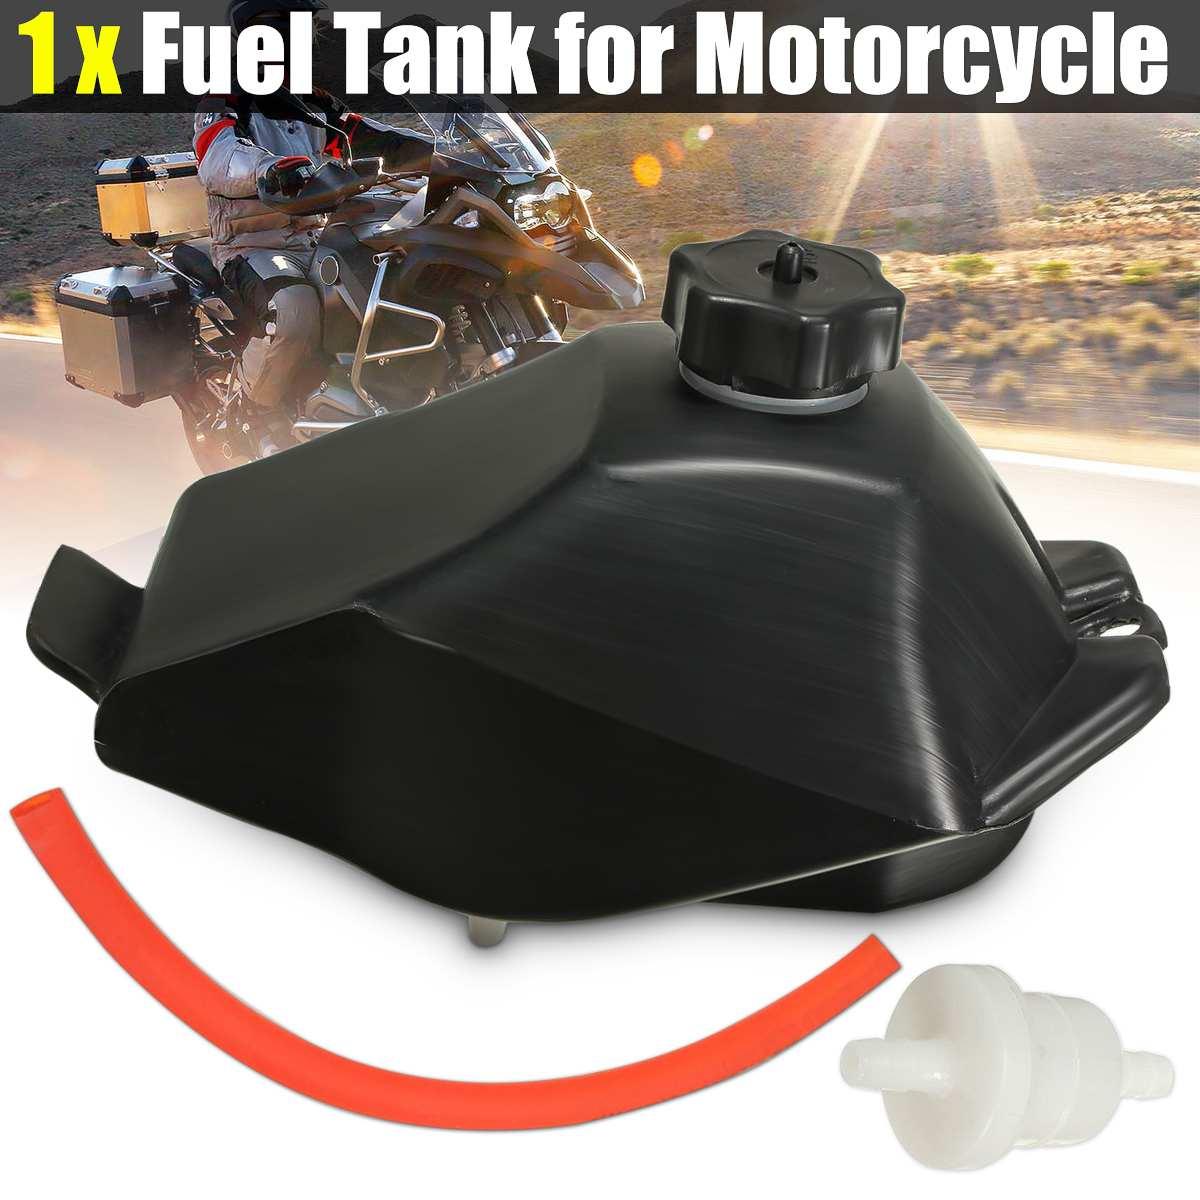 Gás Tanque de Gasolina w/Cap + Mangueira + Kit Filtro de ar Para Mini Moto ATV Quad Moto Kart